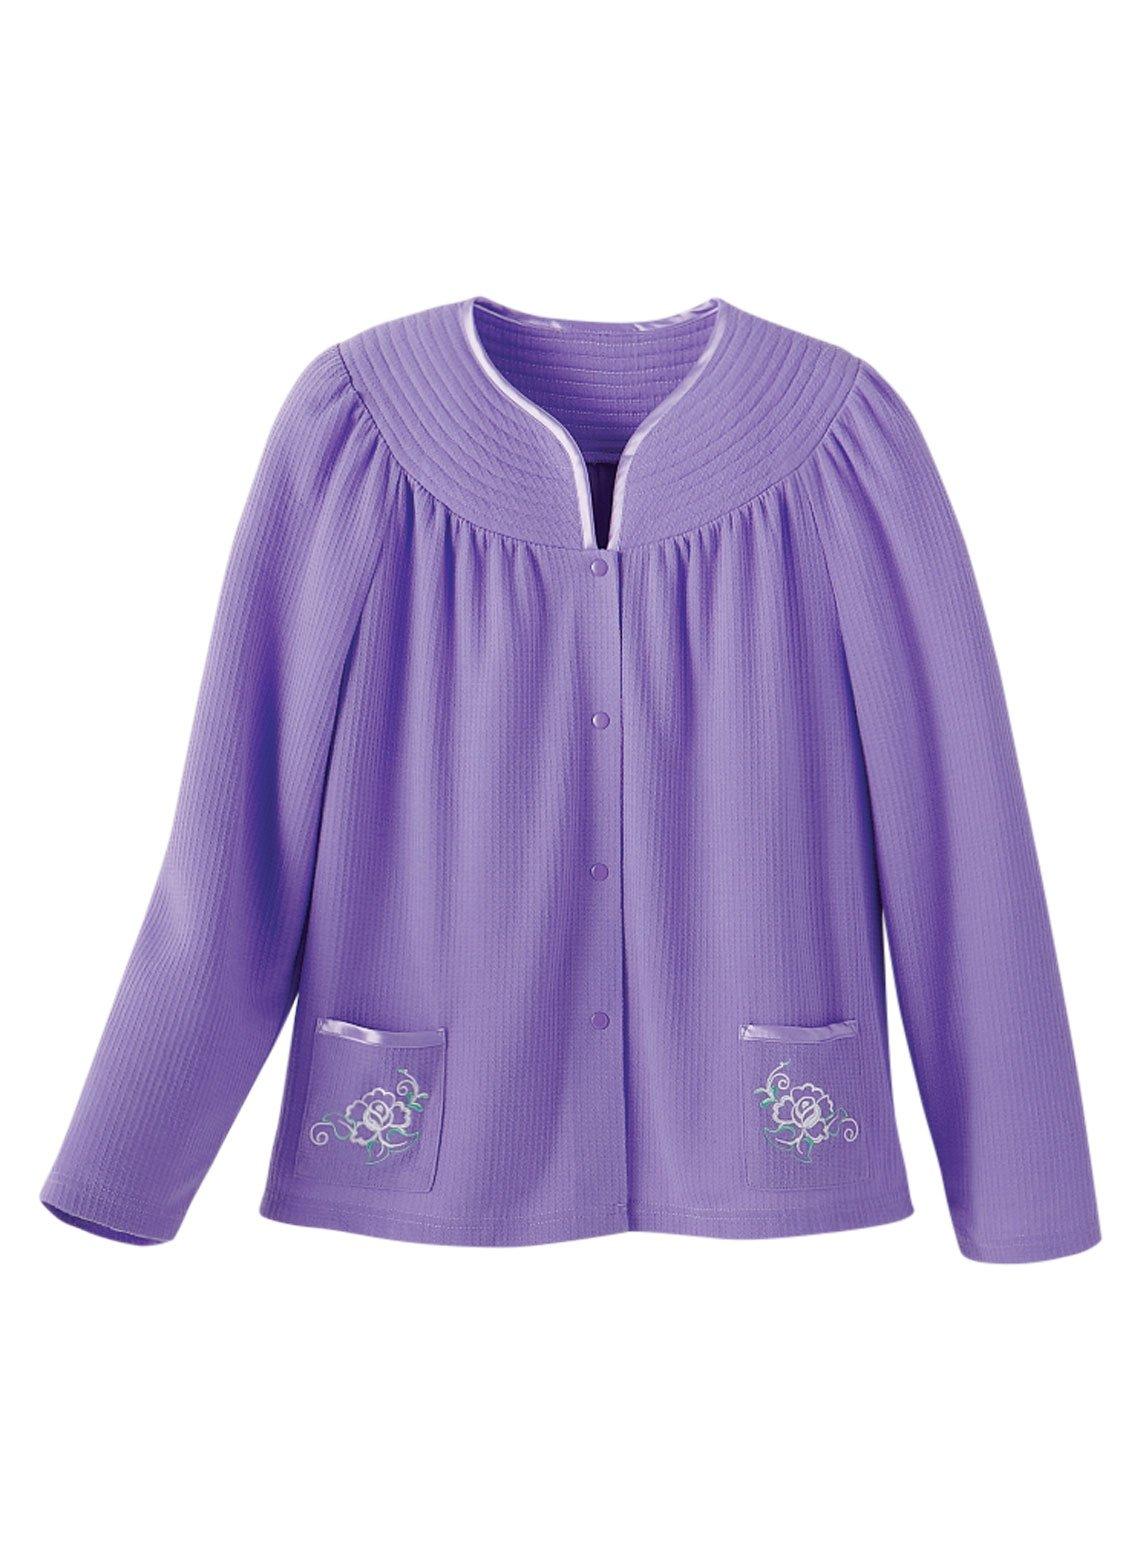 Carol Wright Gifts Waffle Bed Jacket, Color Lilac, Size Medium, Lilac, Size Medium